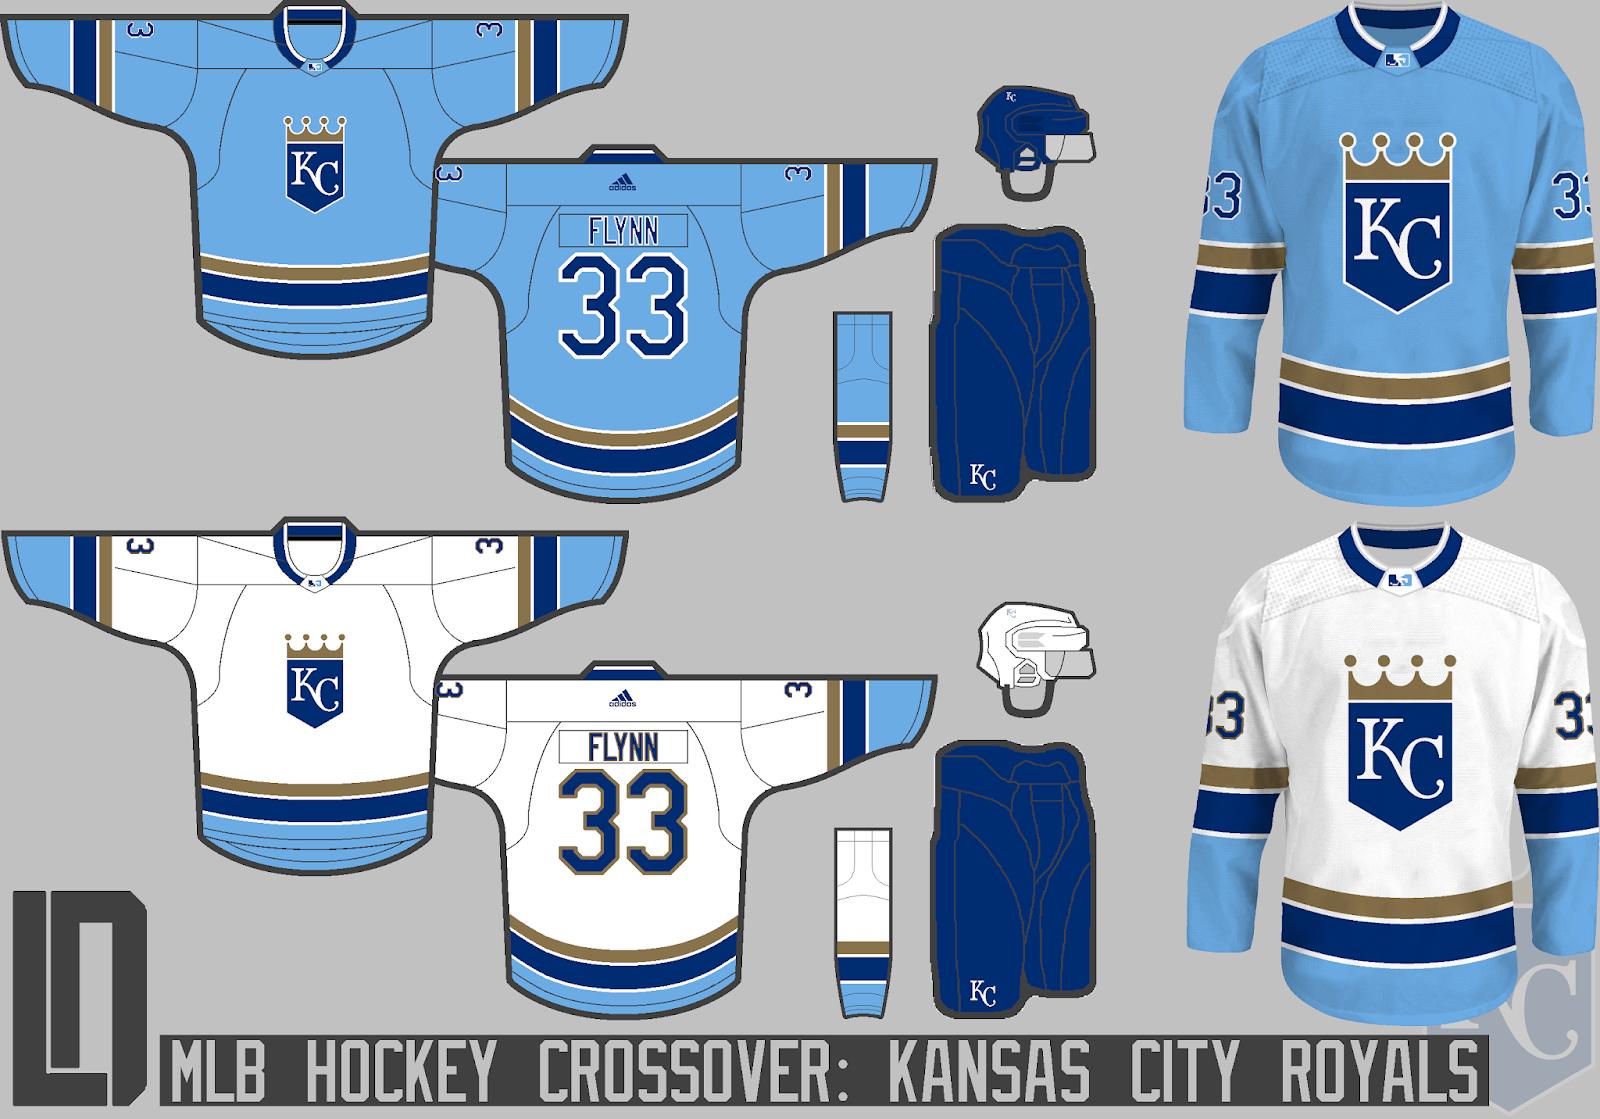 Kansas+City+Royals+Concept.png